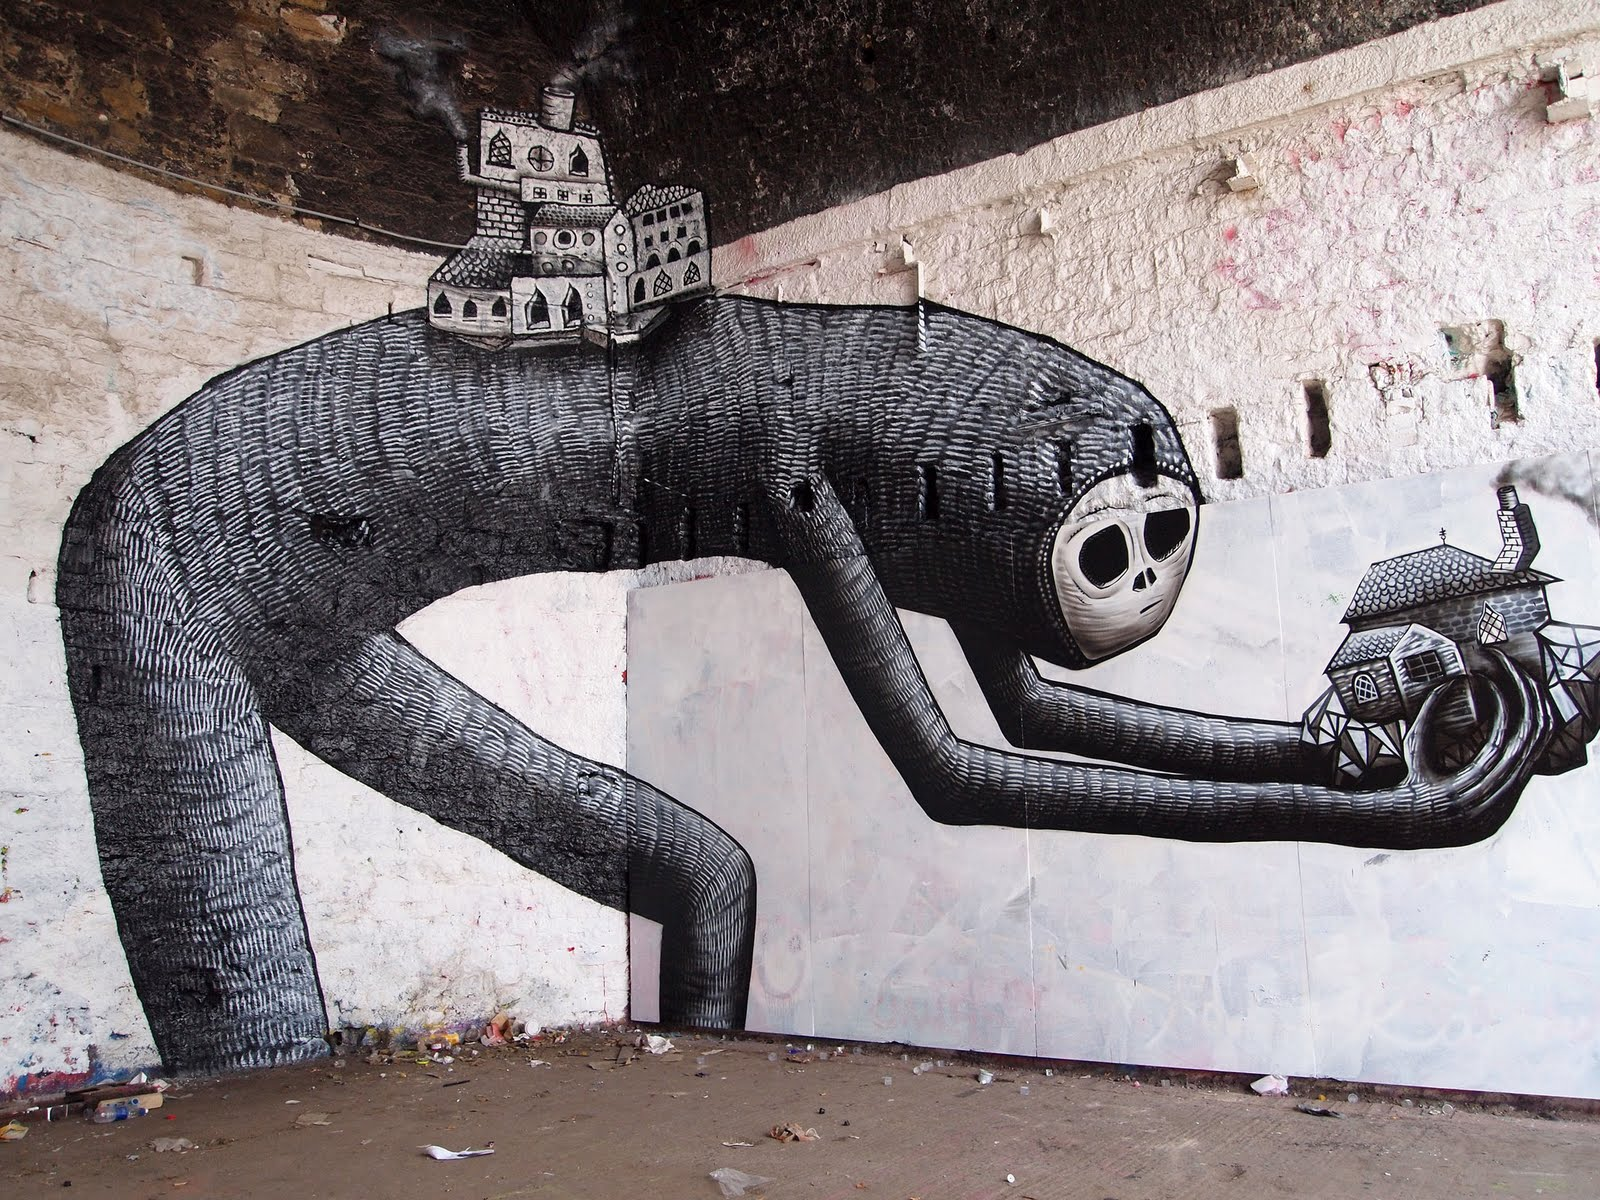 Graffiti Wallpaper And Background Image